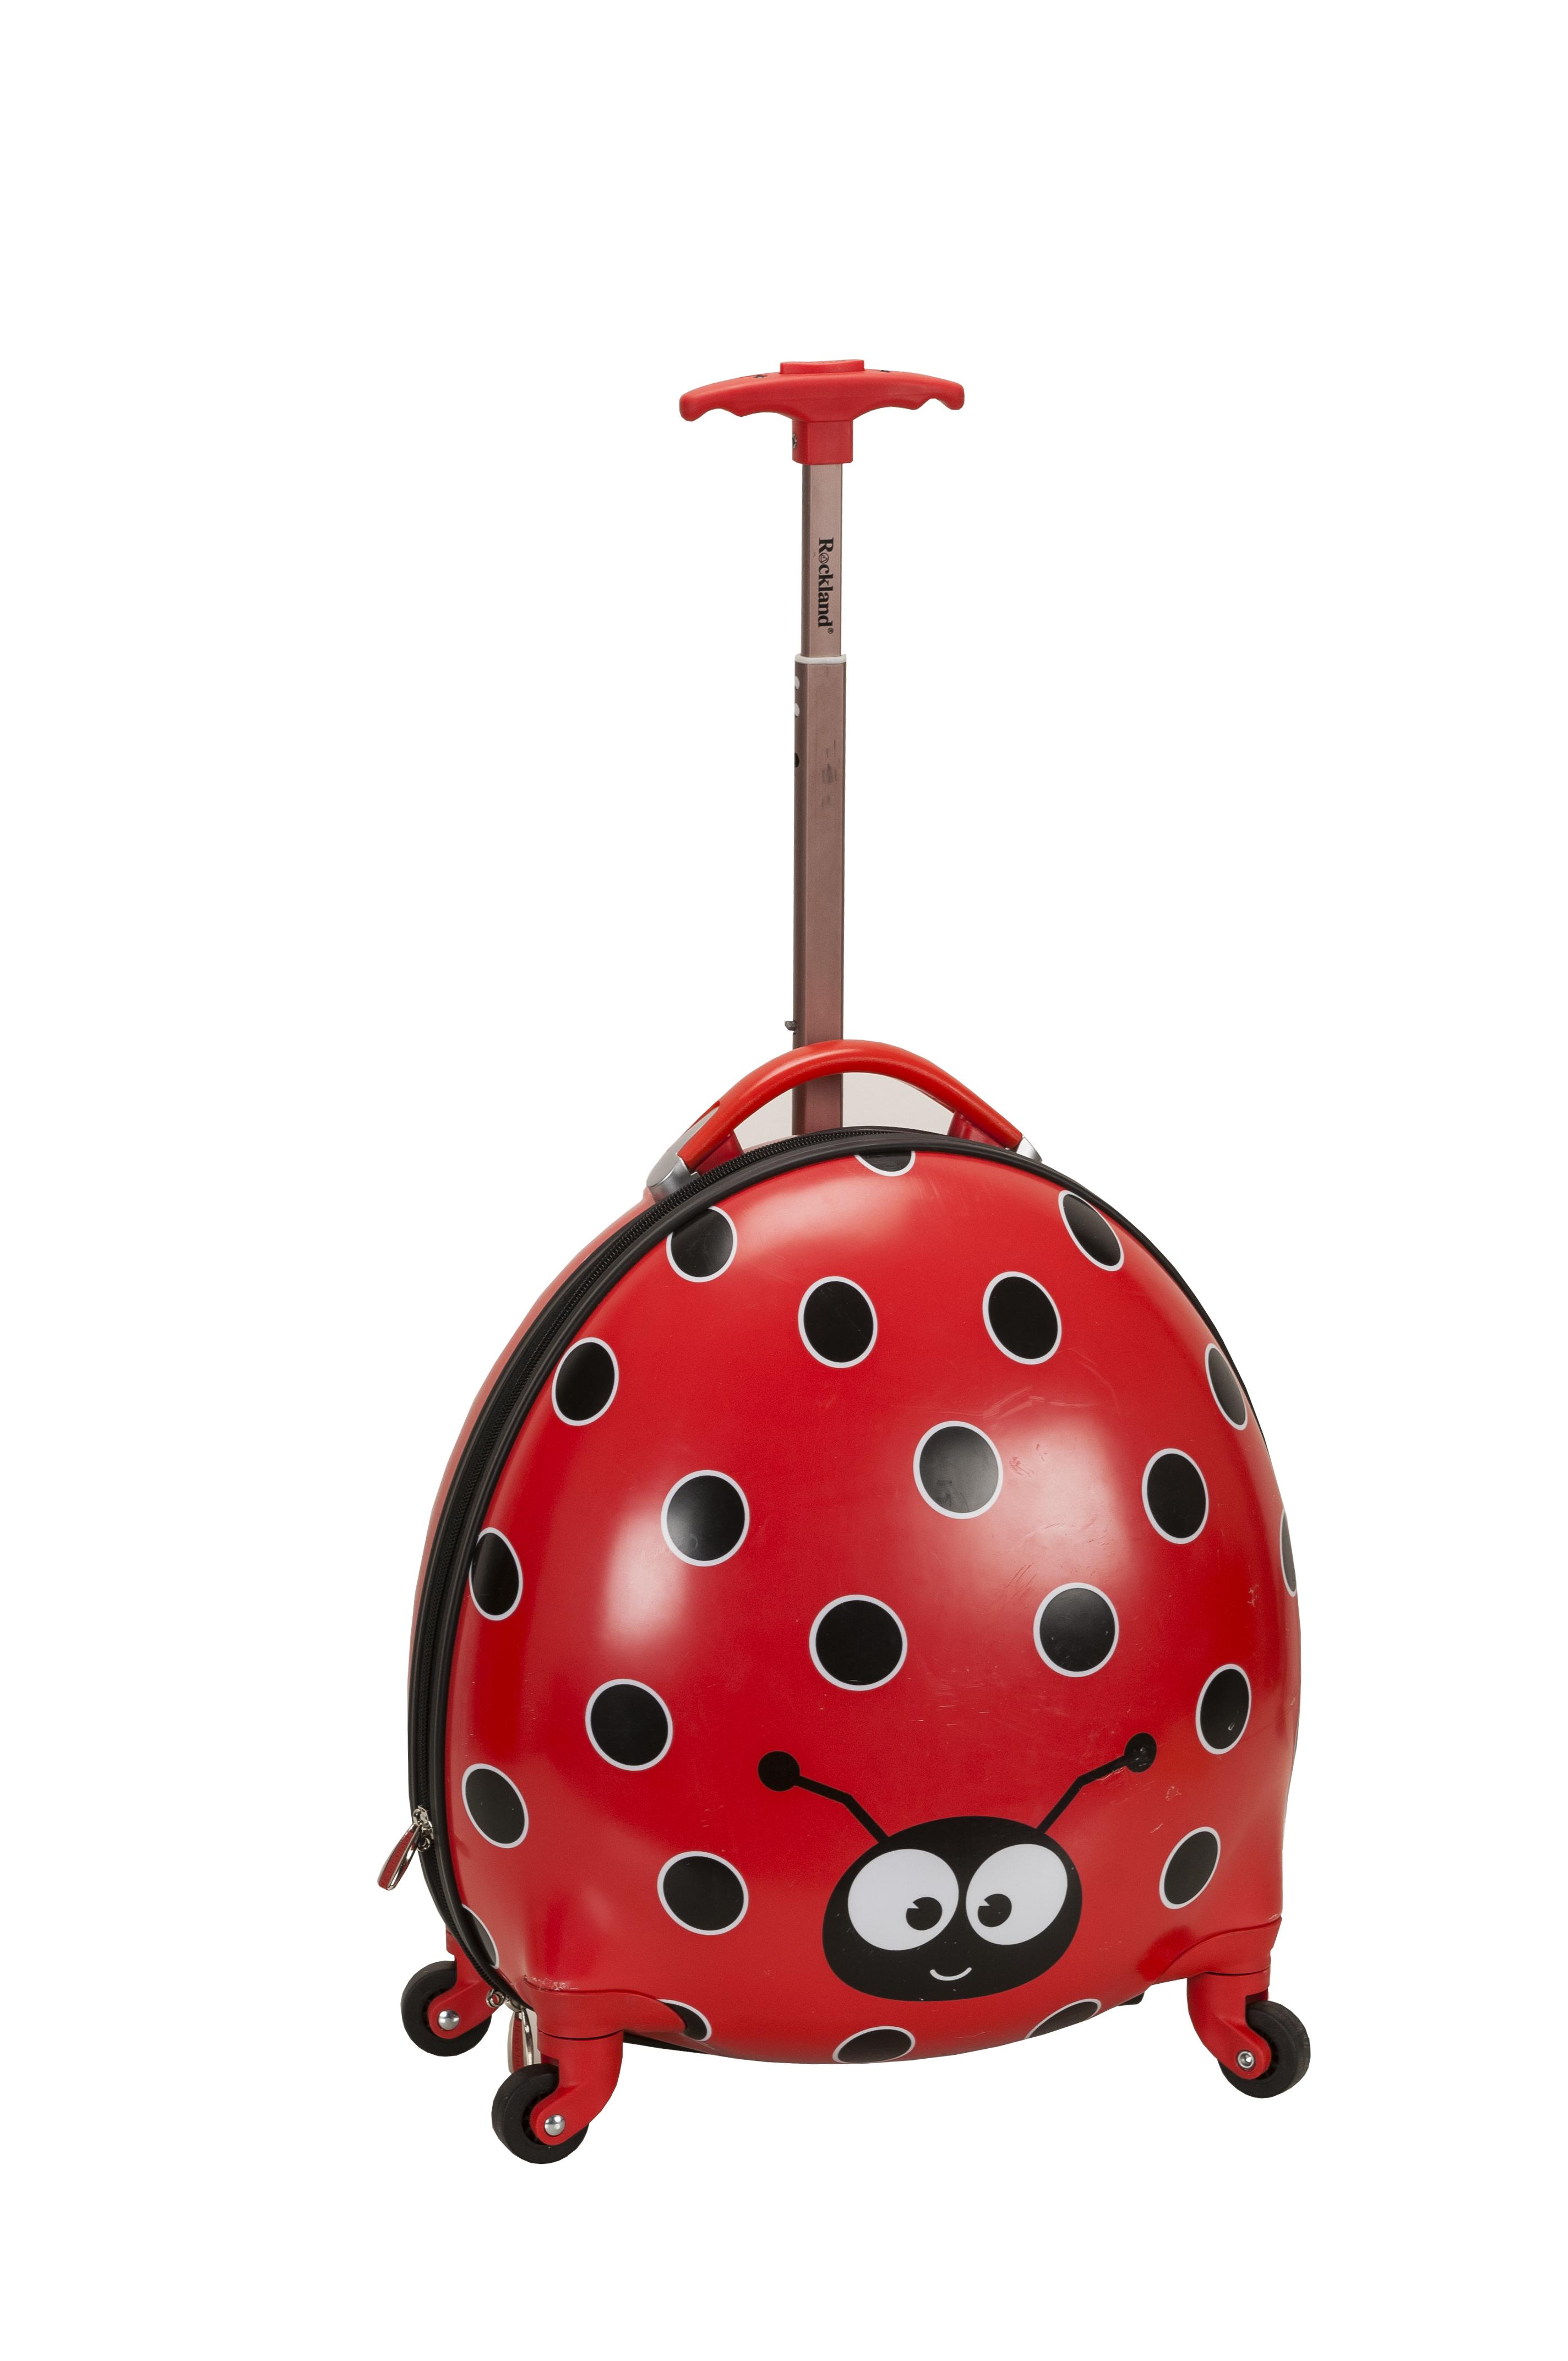 Ladybug Printed Polycarbonate Carry On Luggage